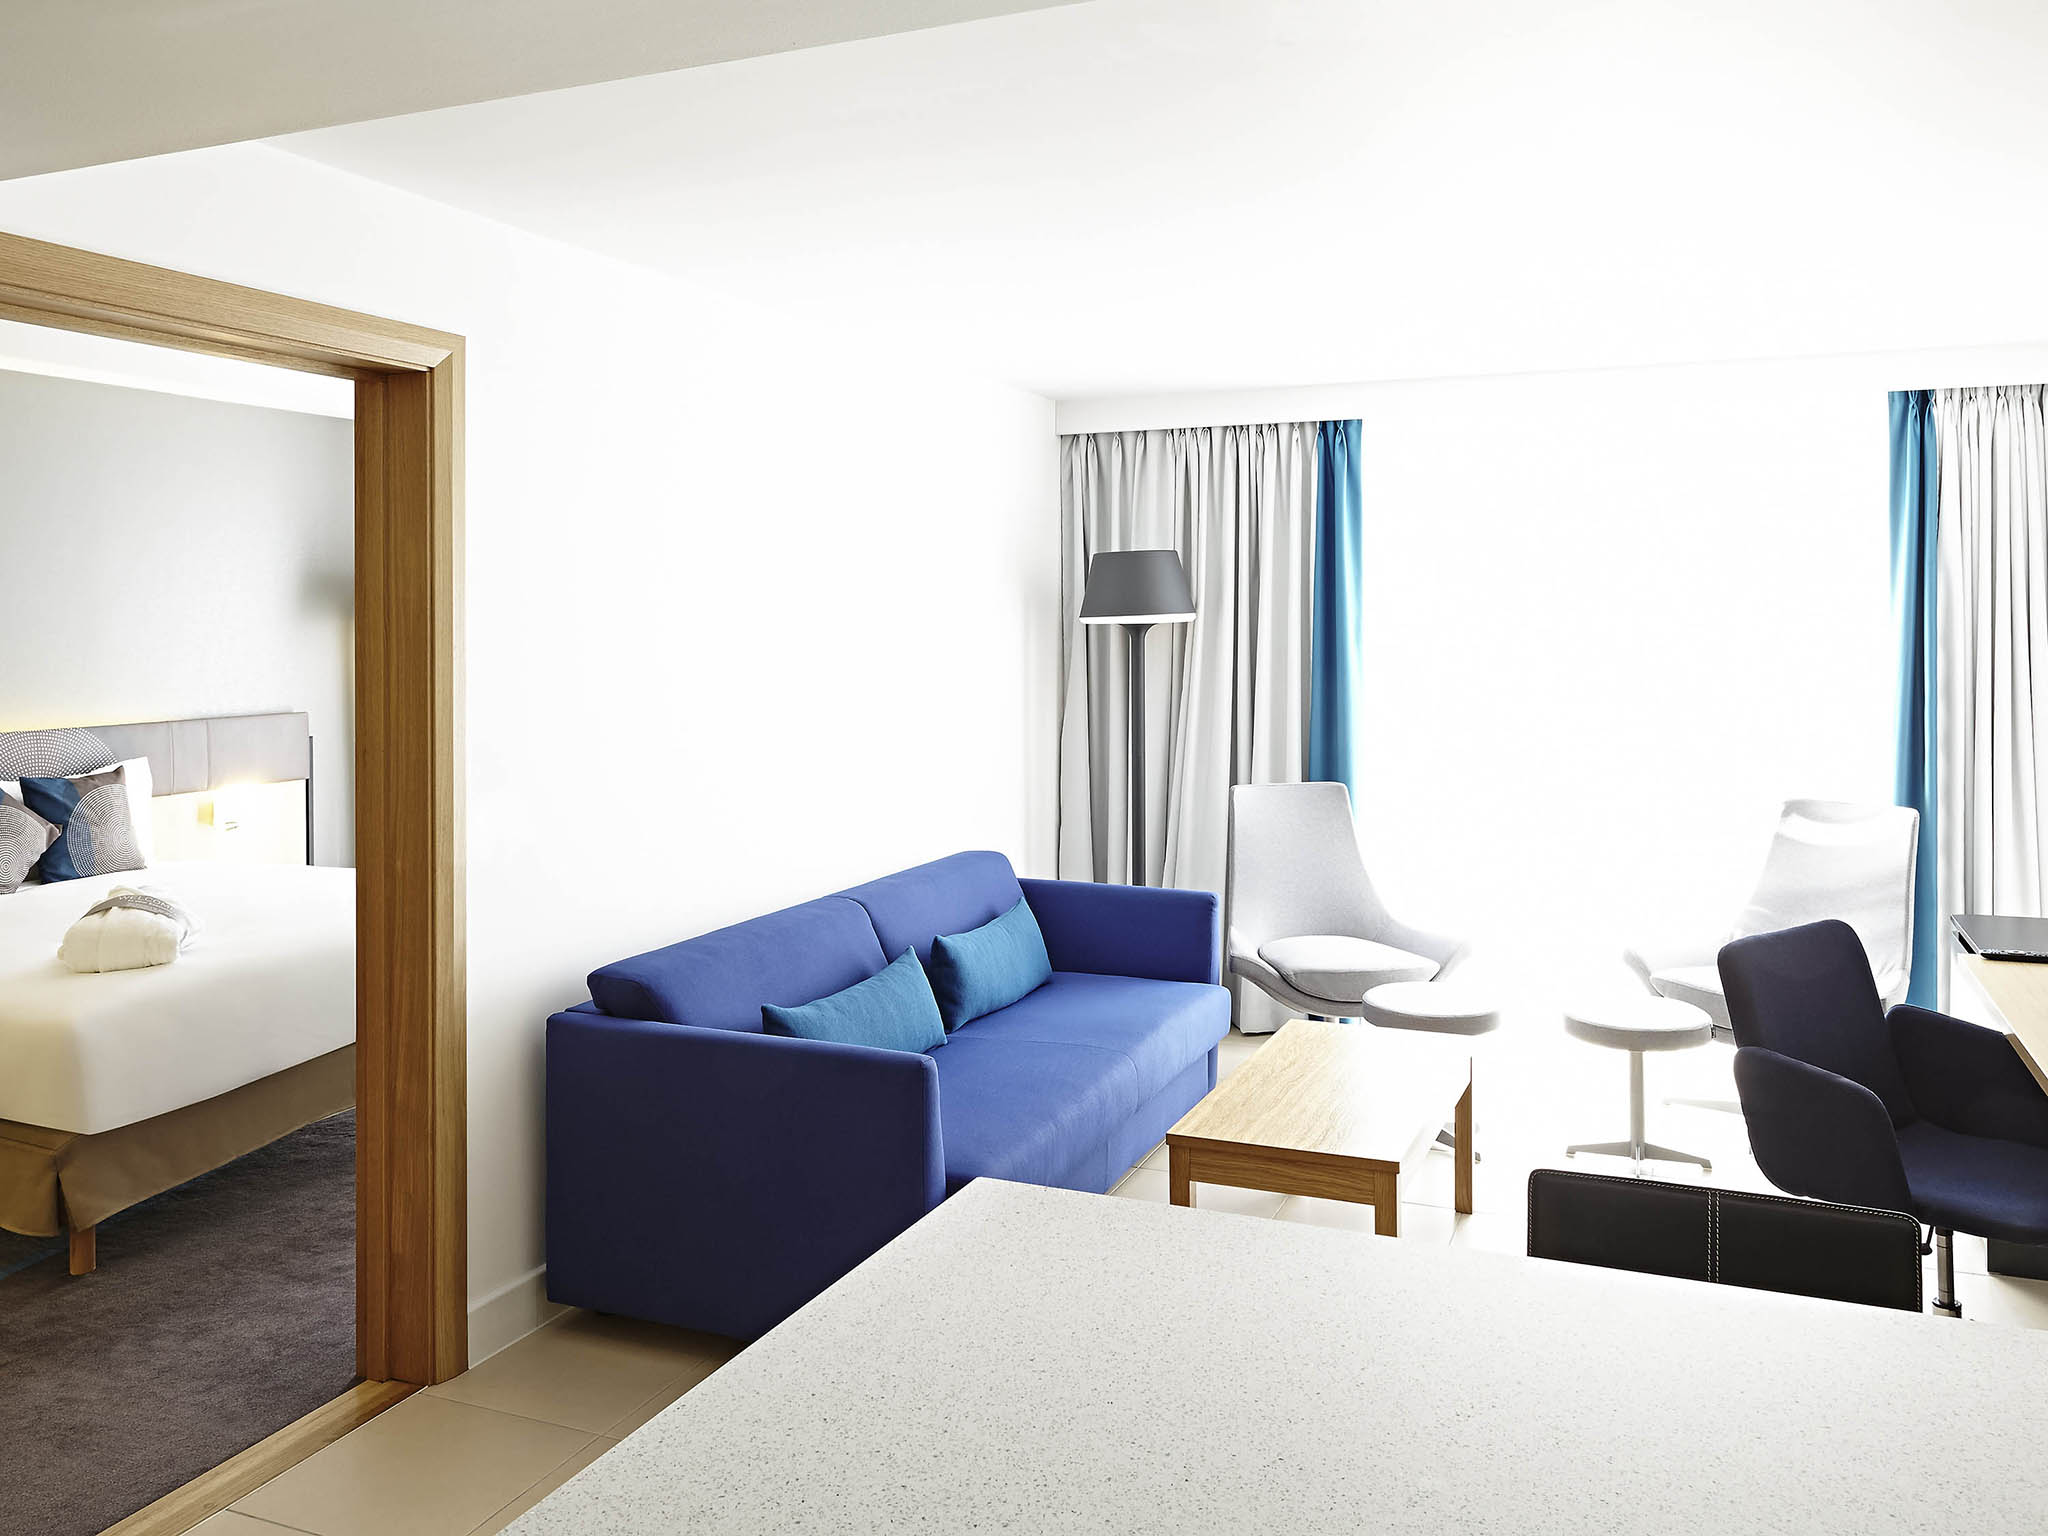 Rooms Novotel London Wembley